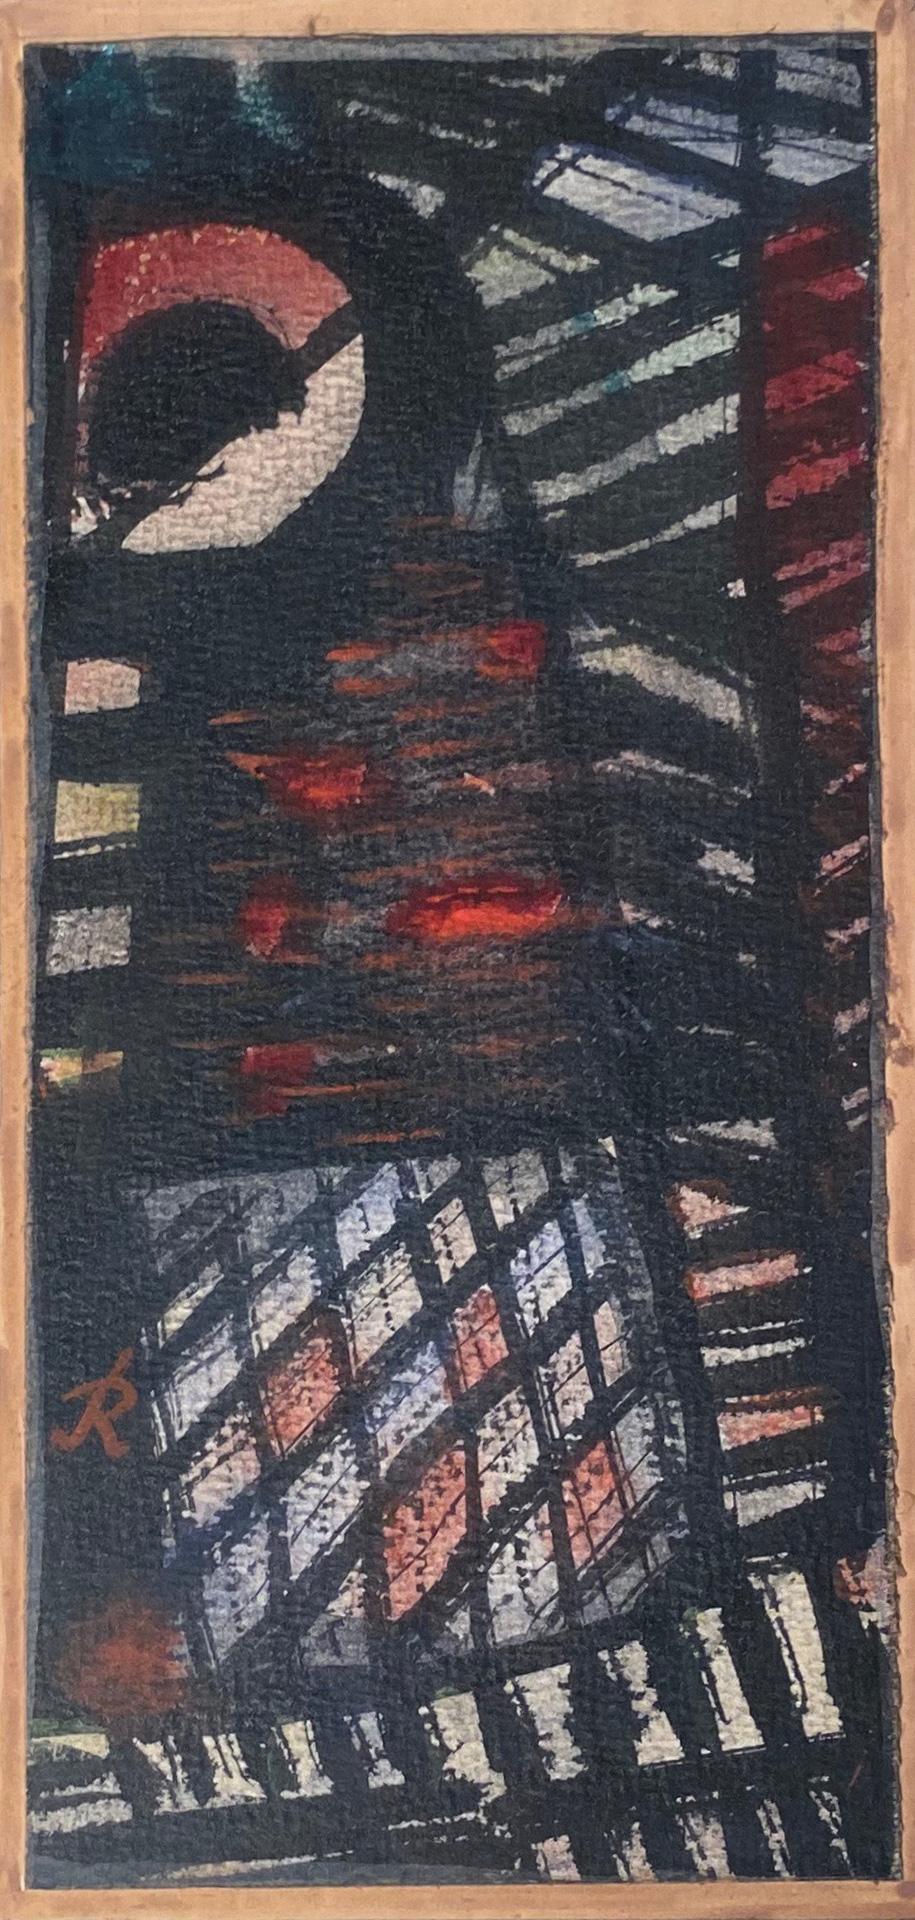 Untitled, 1944-49